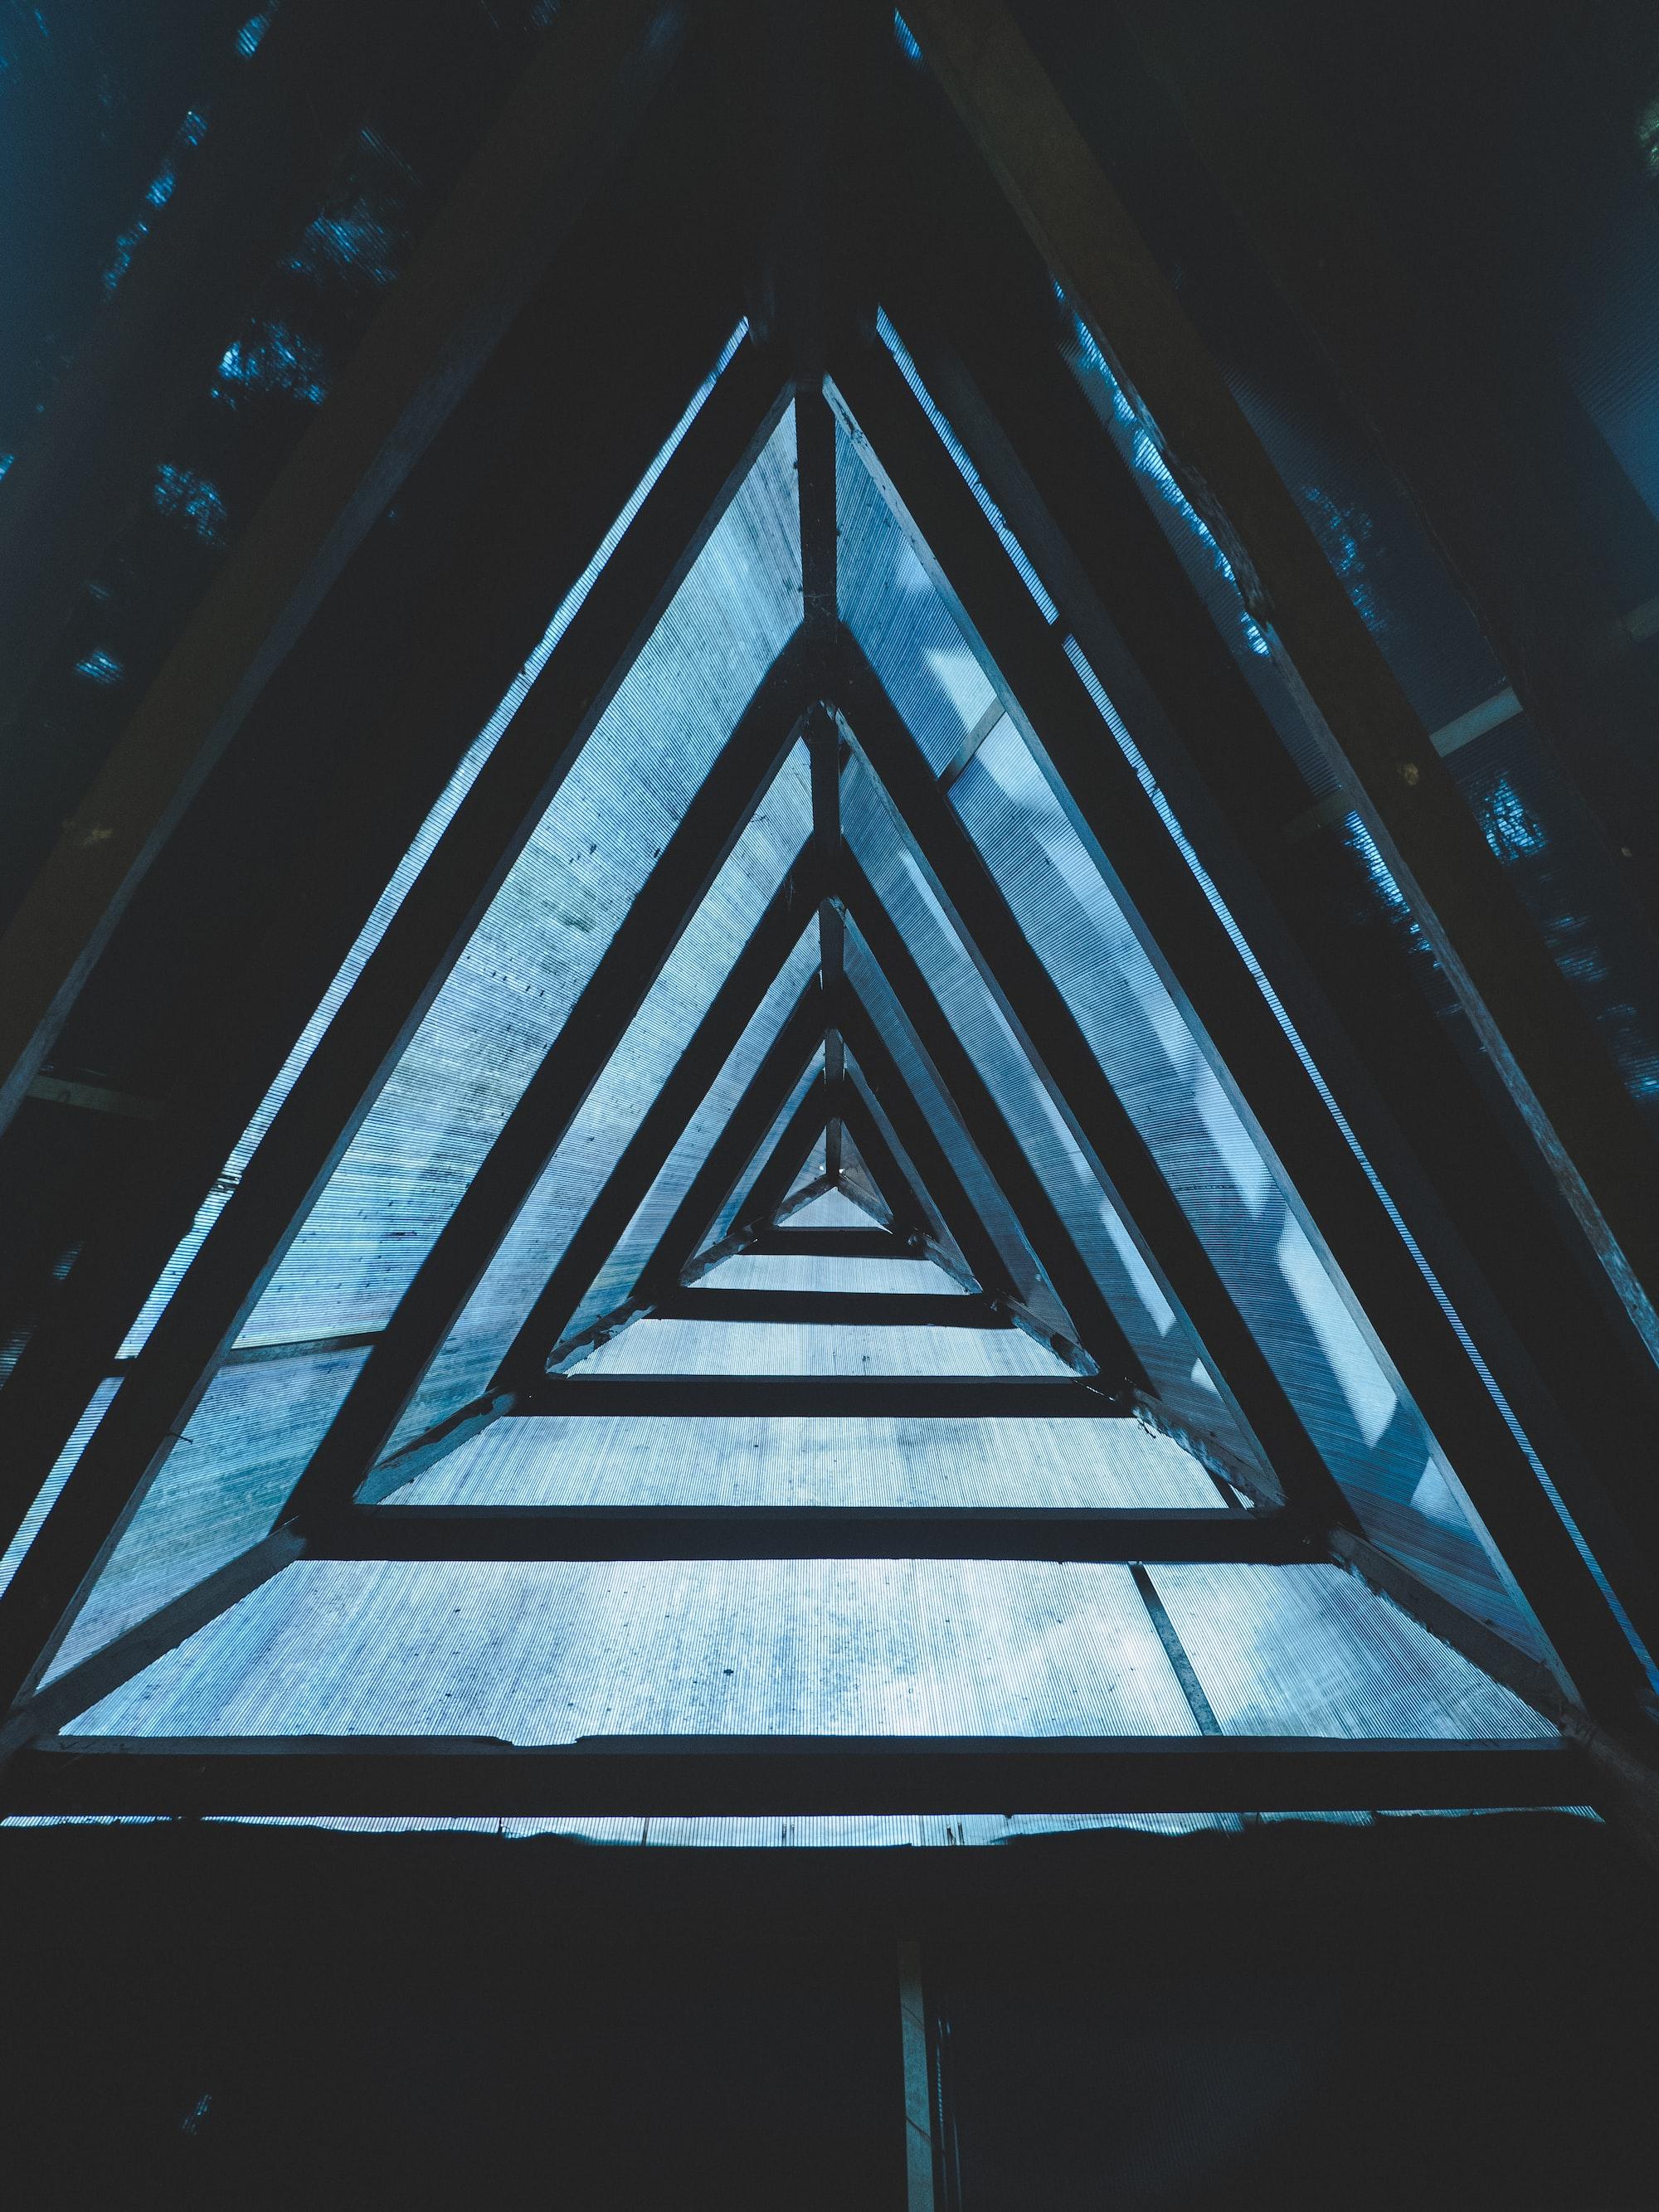 Hackerrank - Triangle Quest 2 Solution